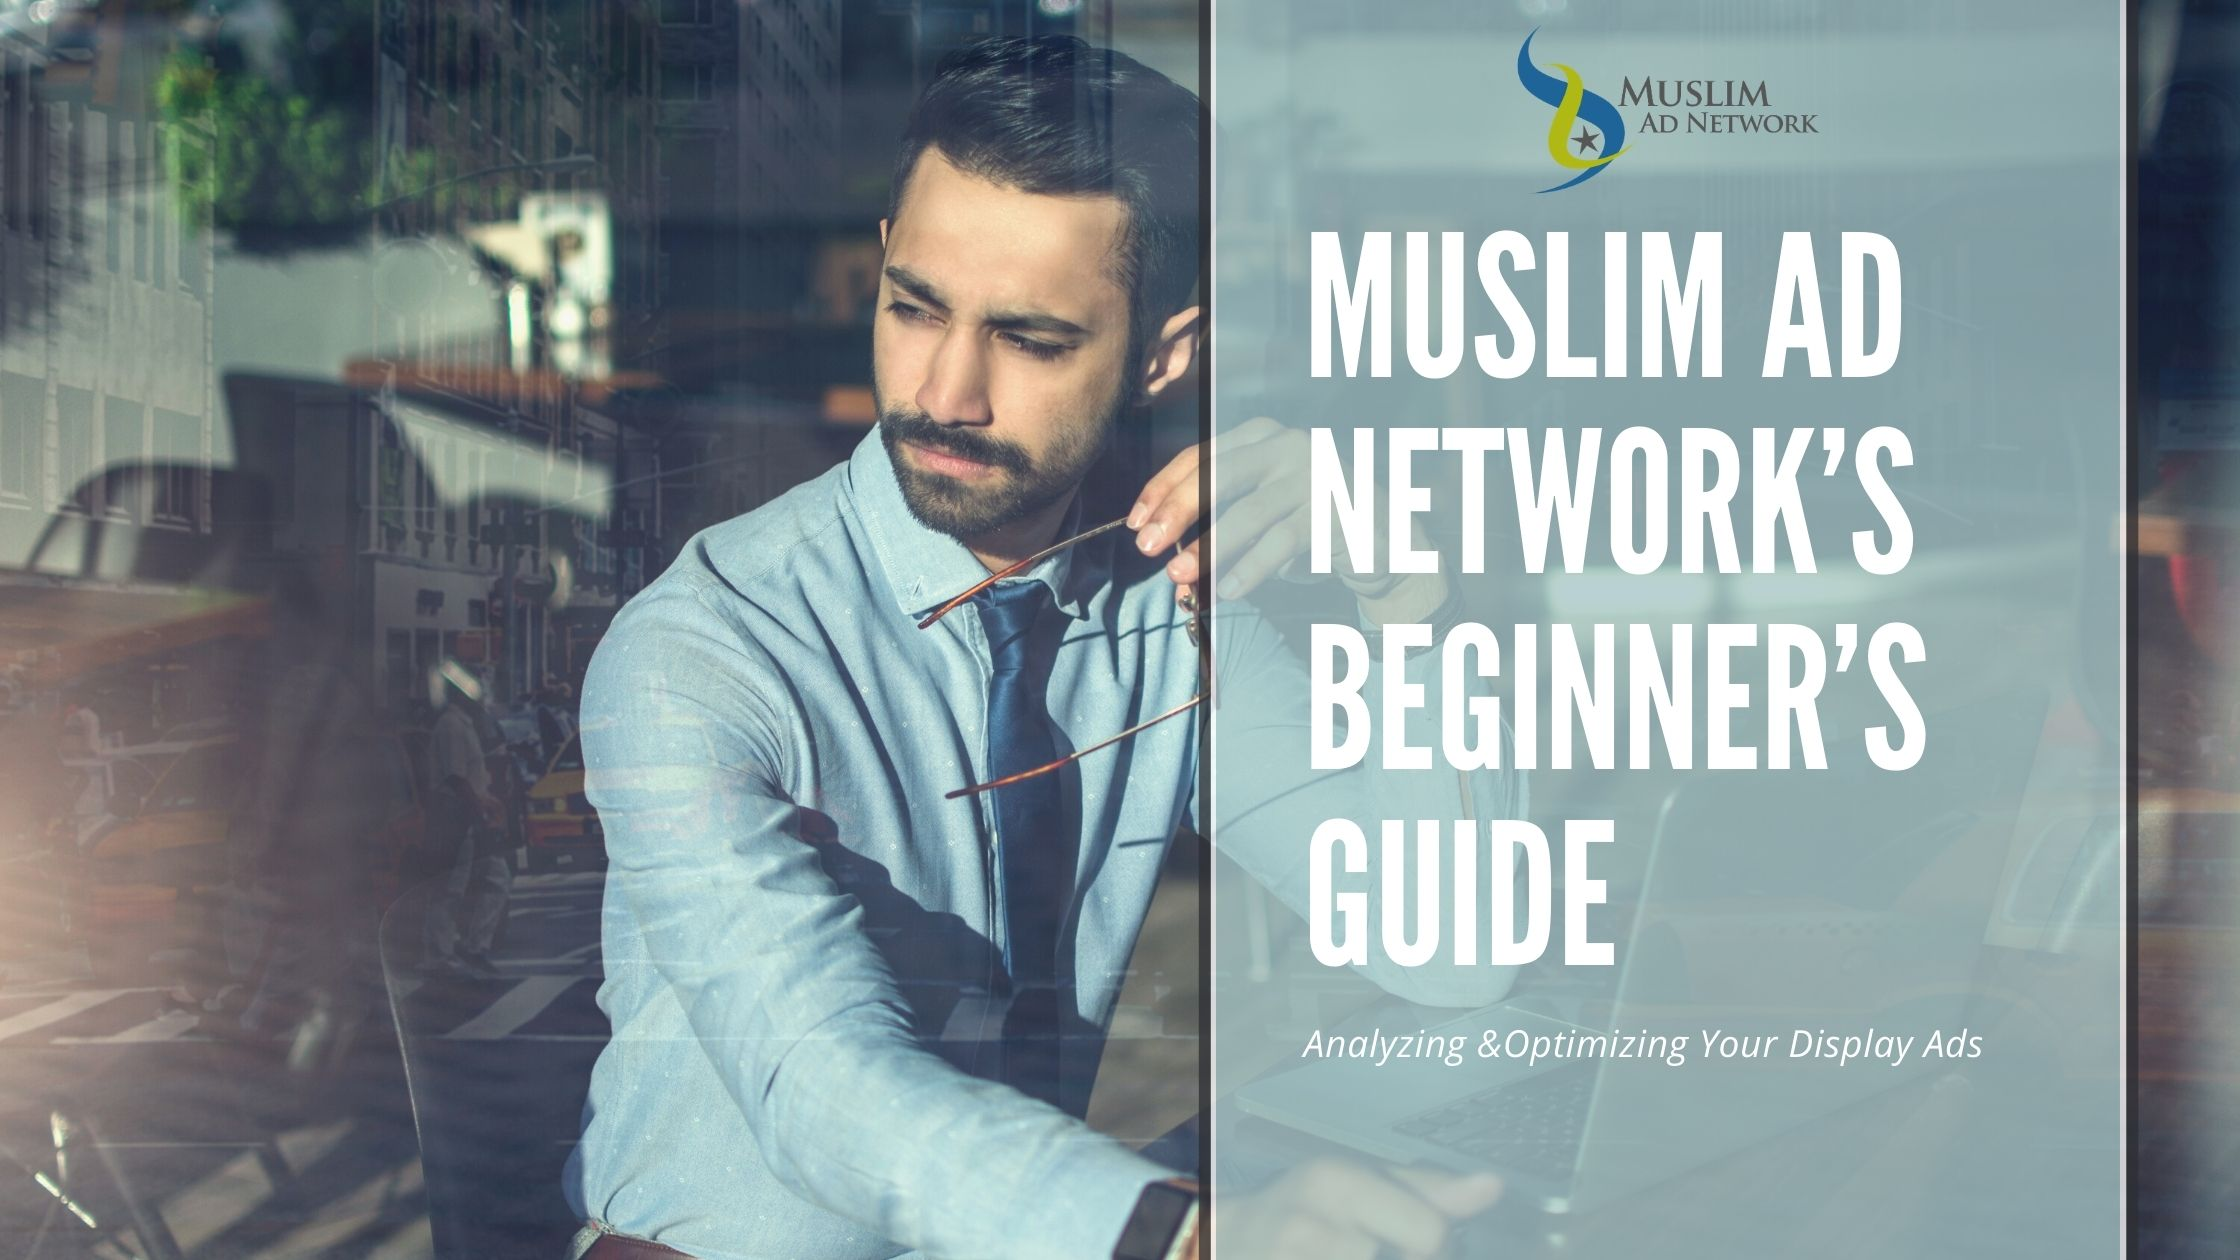 Digital marketing to Muslims